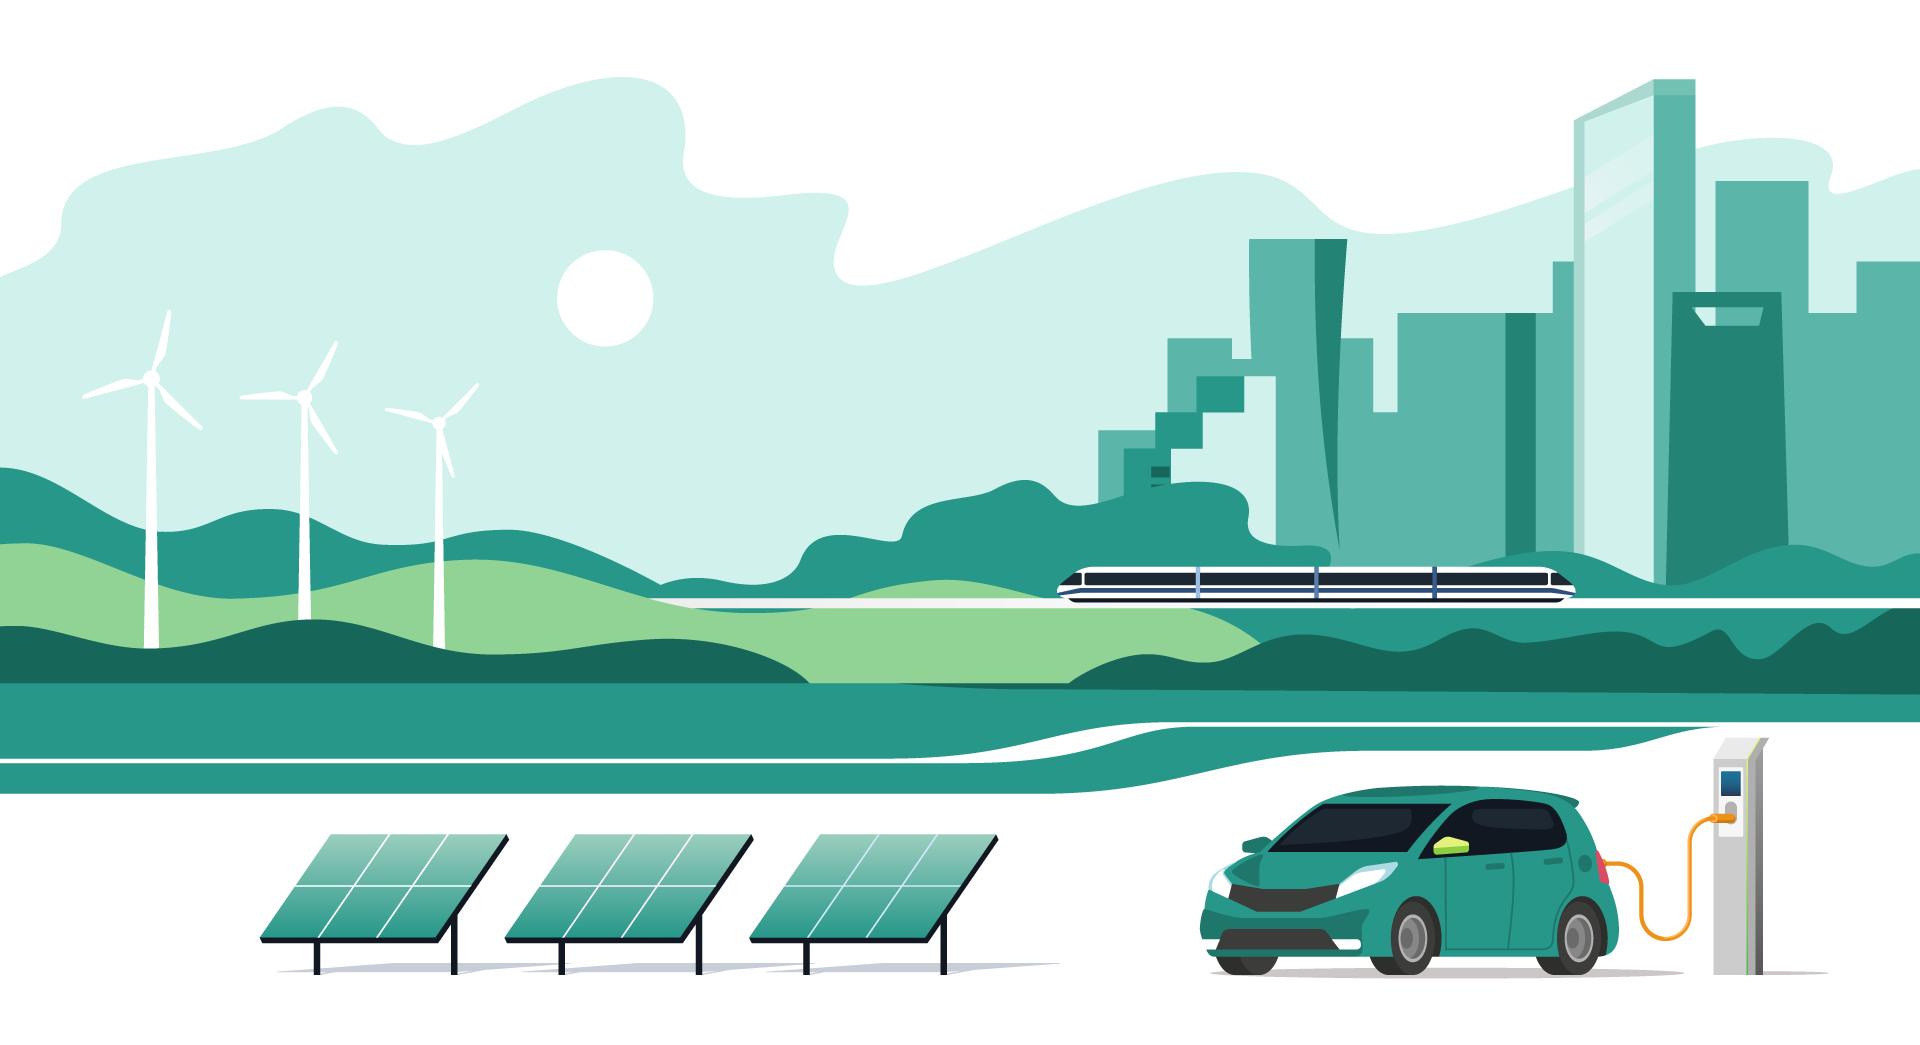 Sustainable-Last-Mile-Electric-Vehicle